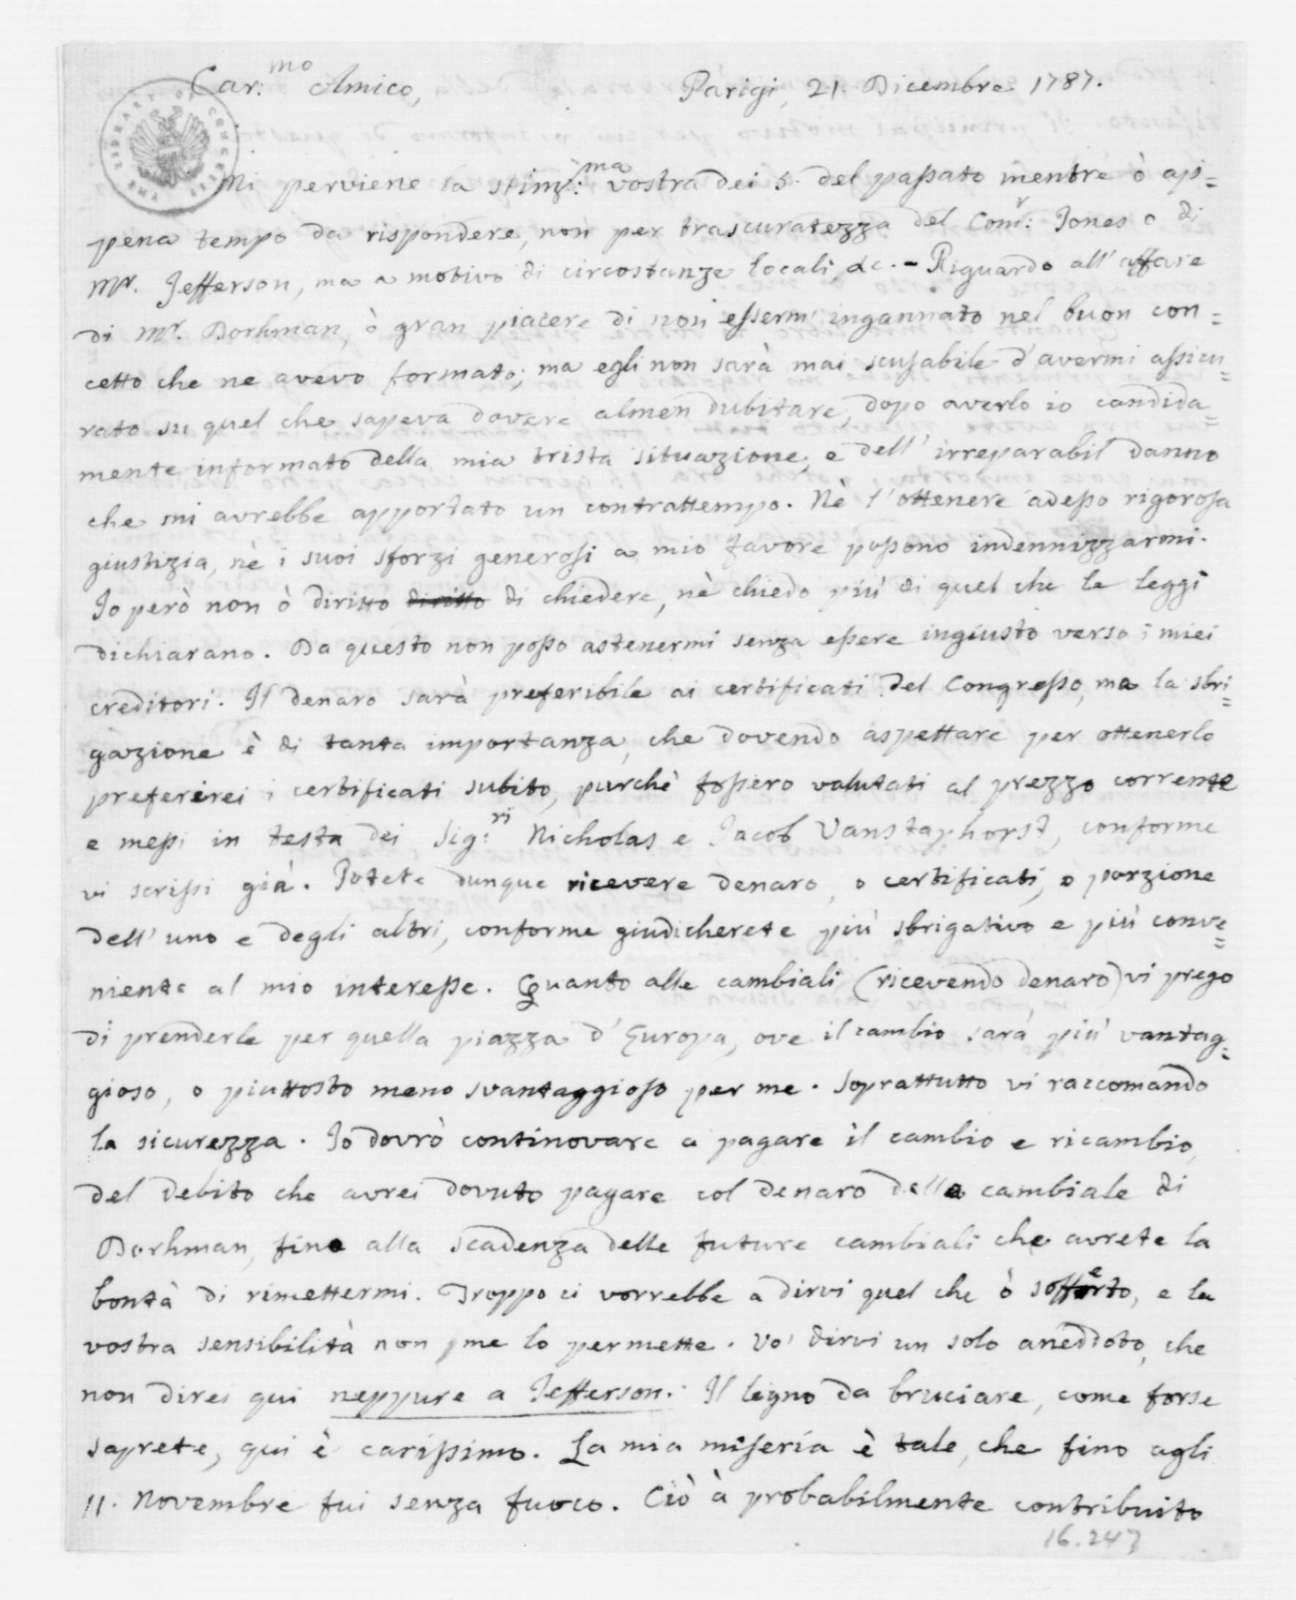 Philip Mazzei to James Madison, December 21, 1787. In Italian.